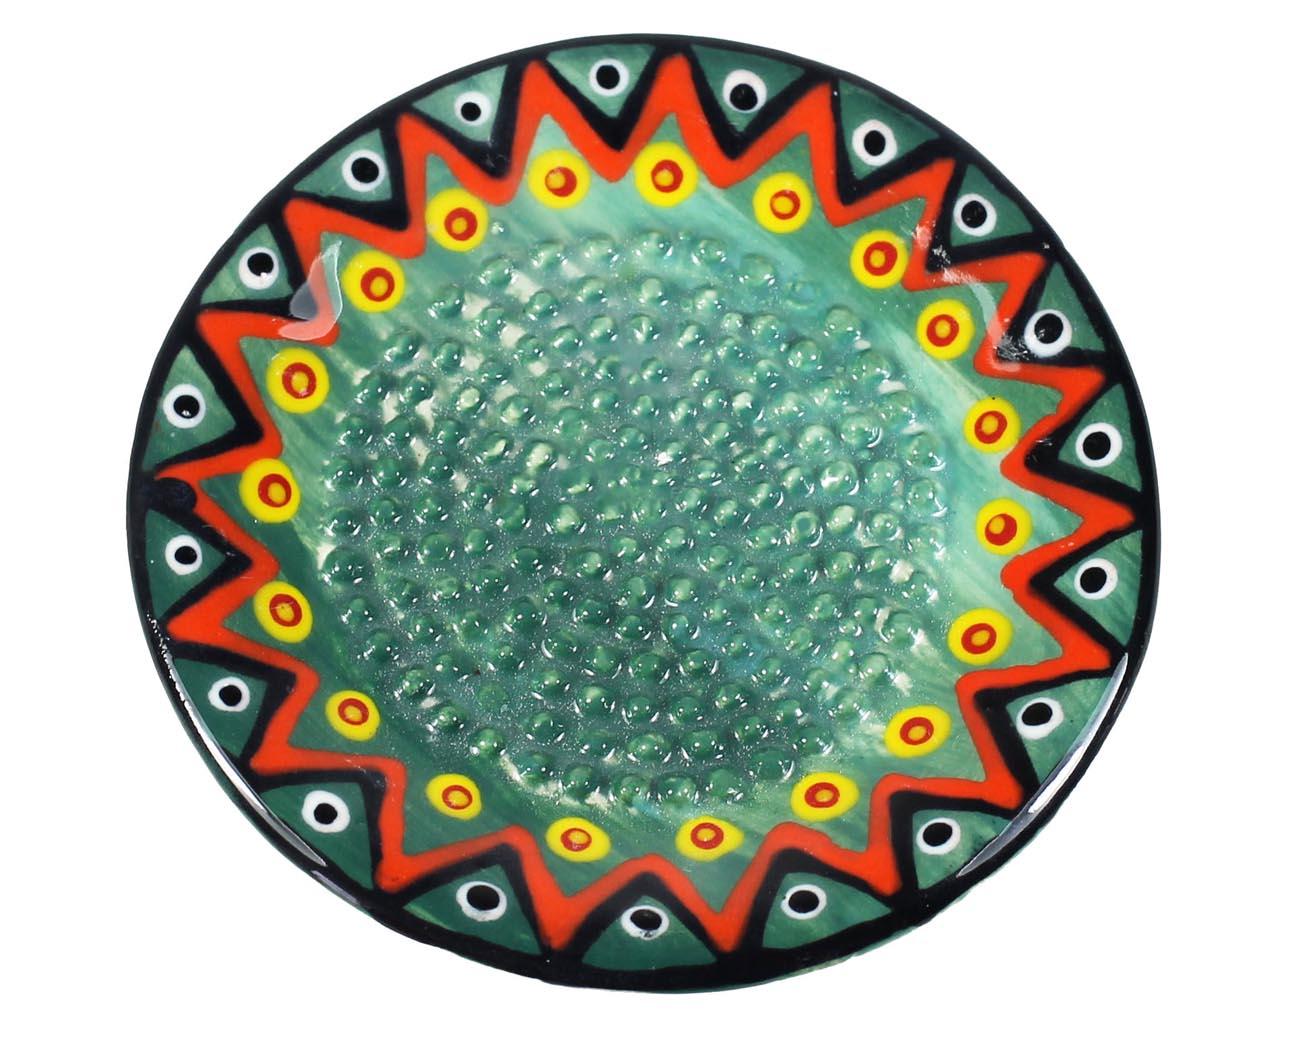 Keramikreibe - Türkiser Ozean B